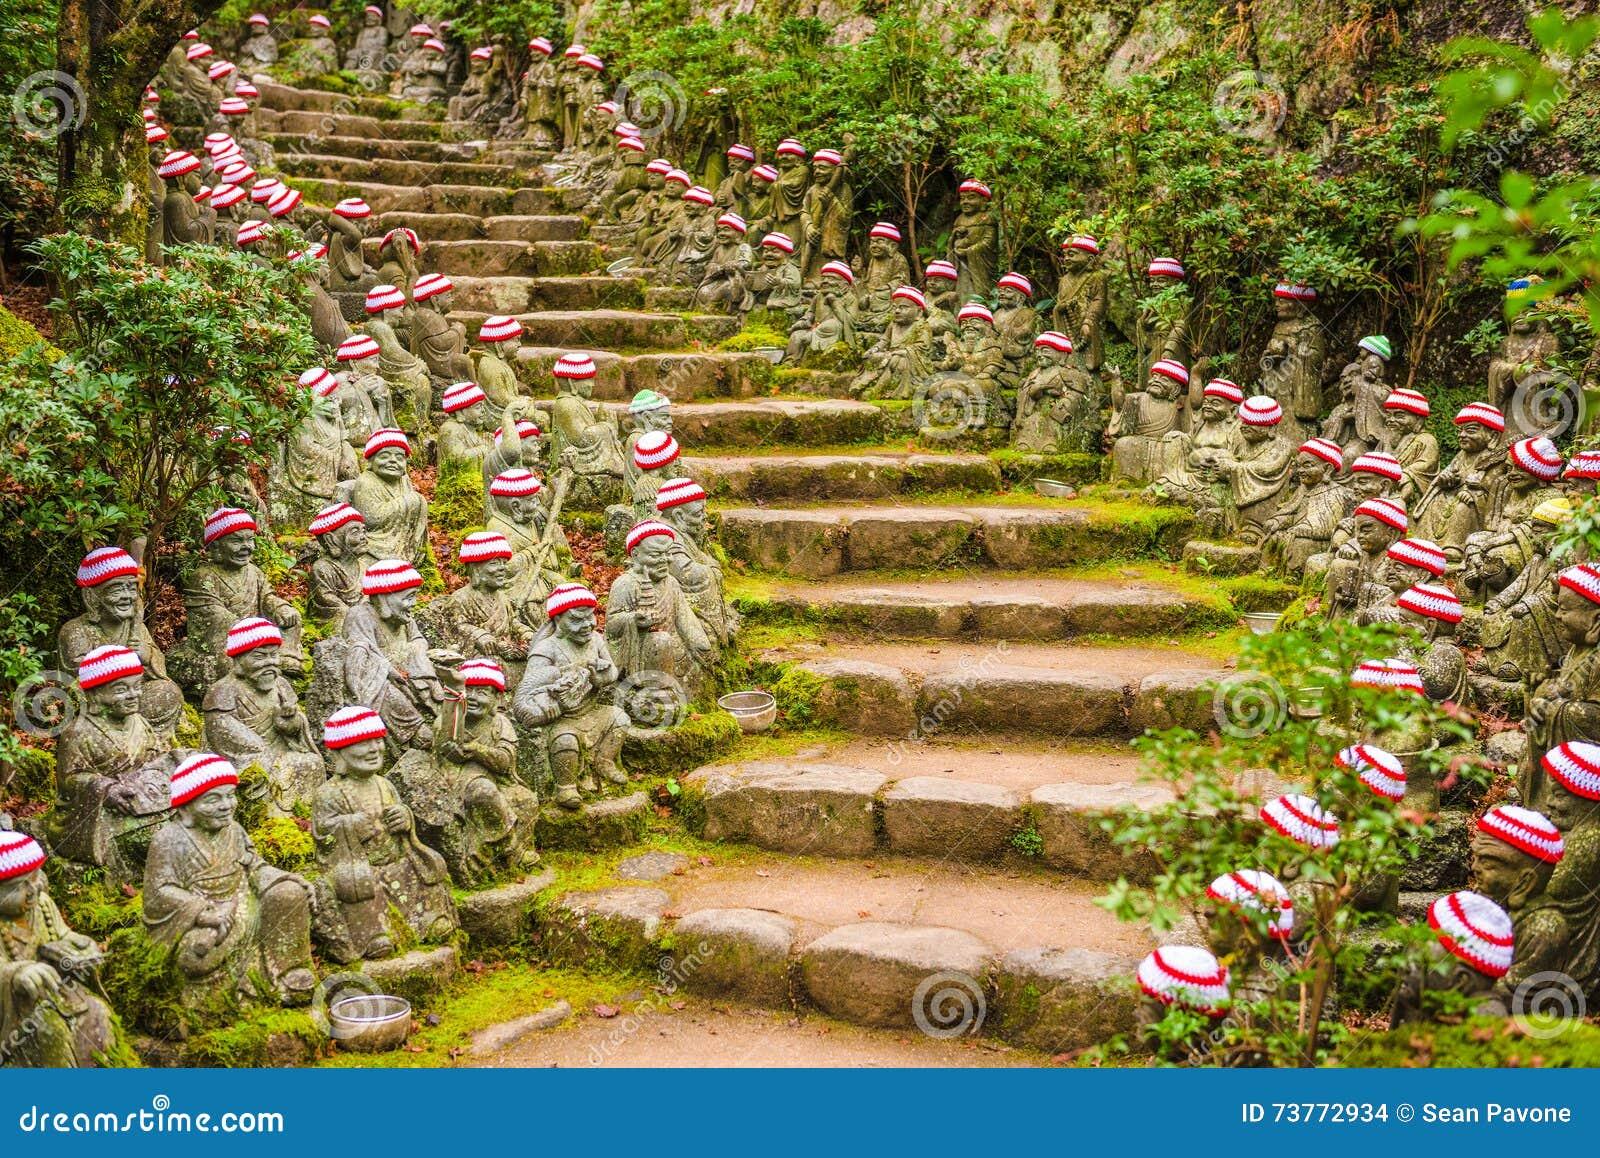 Miyajima, Japan Temple Grounds Stock Photo - Image of scenic, garden ...